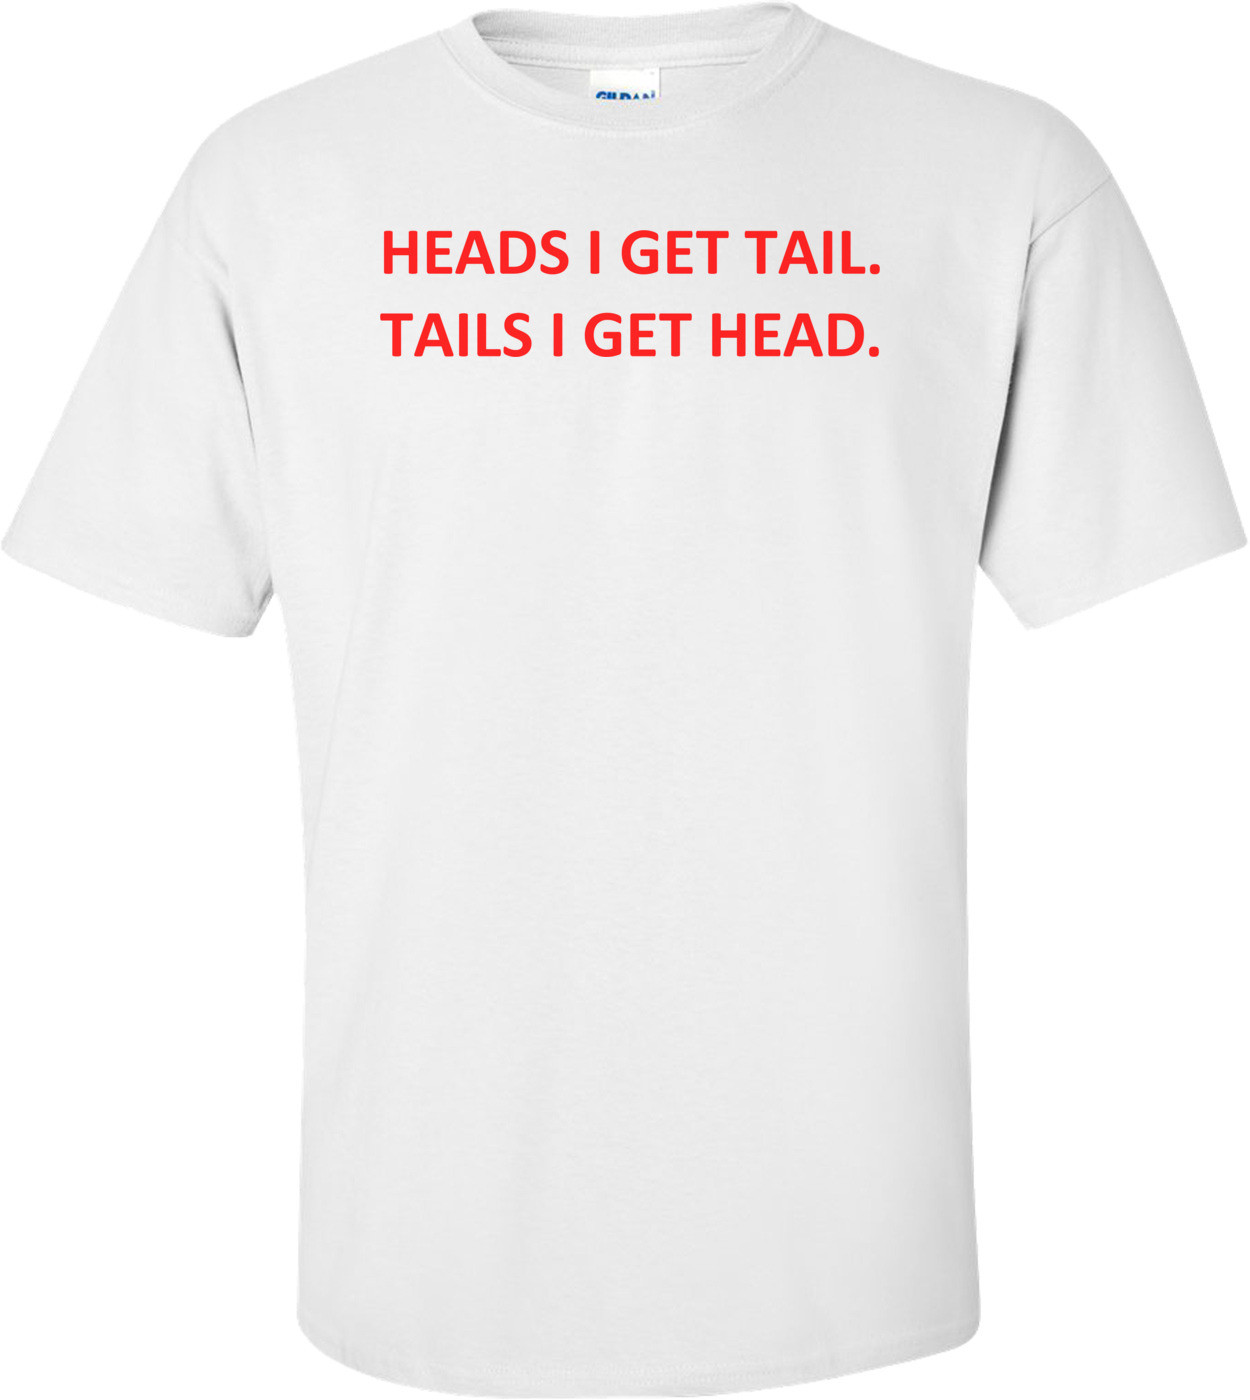 HEADS I GET TAIL. TAILS I GET HEAD. Shirt